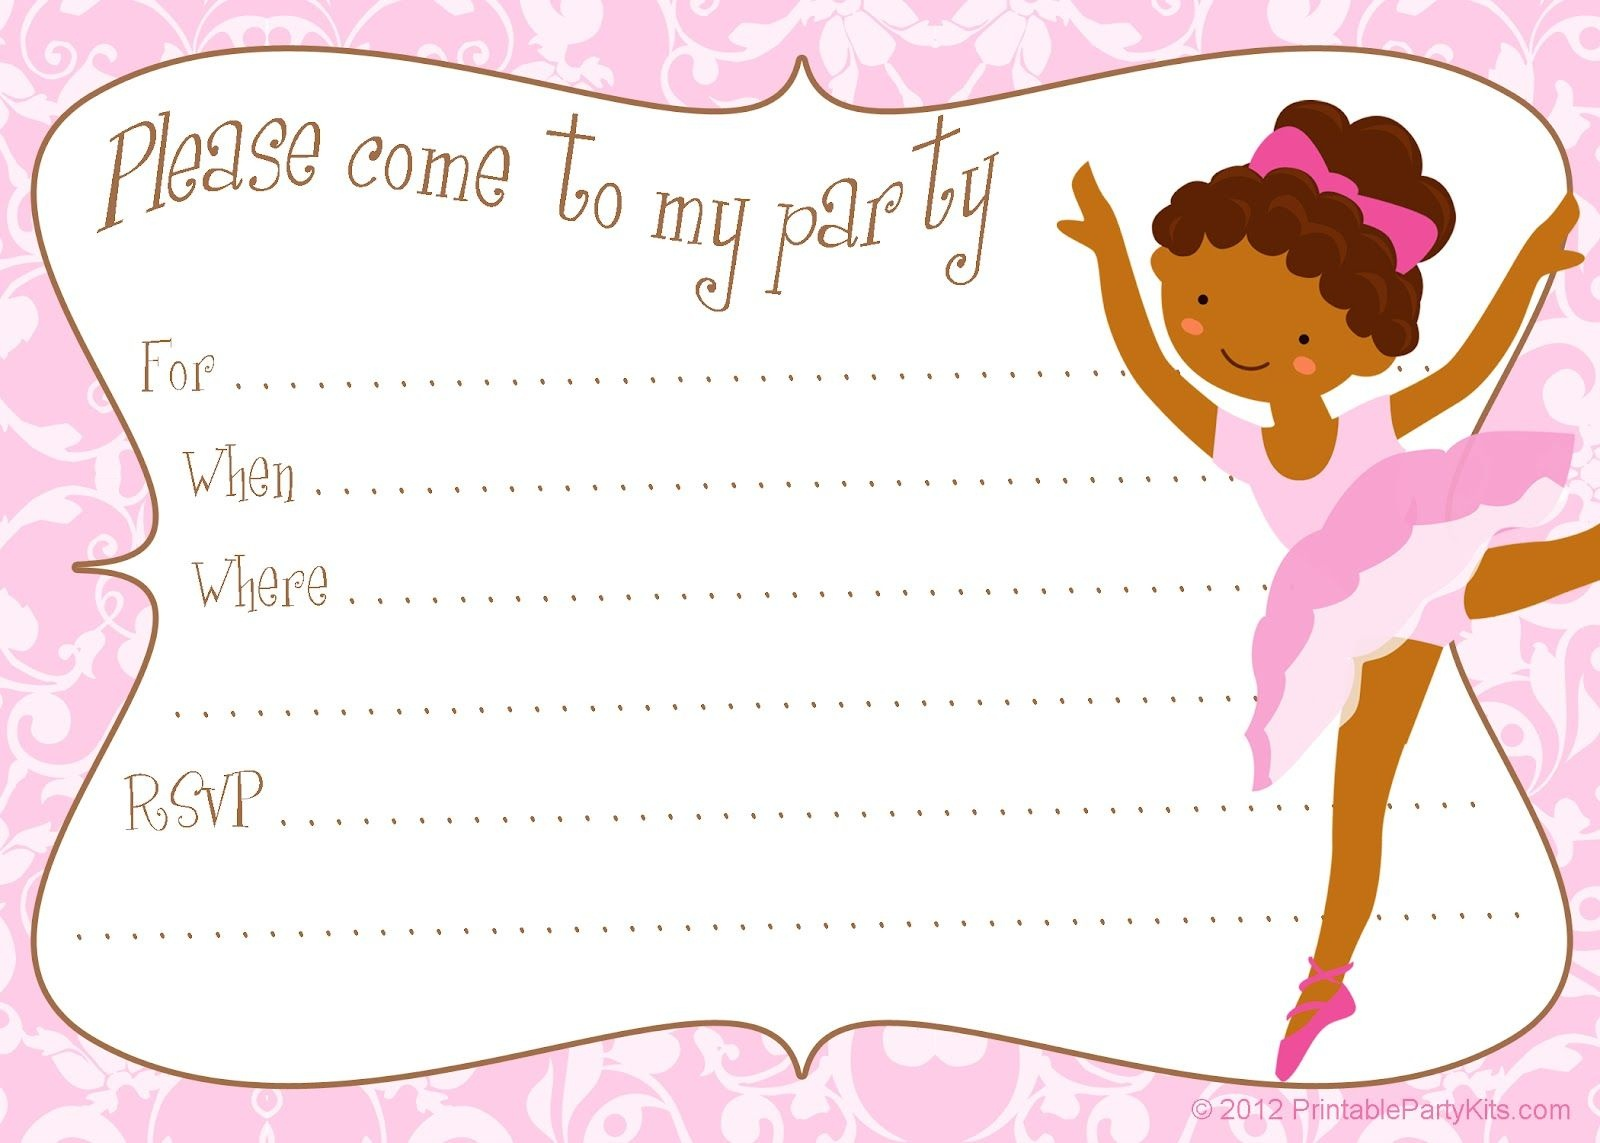 Free Printable Party Invitations: Printable Free Ballerina Party - Free Printable Ballerina Birthday Invitations